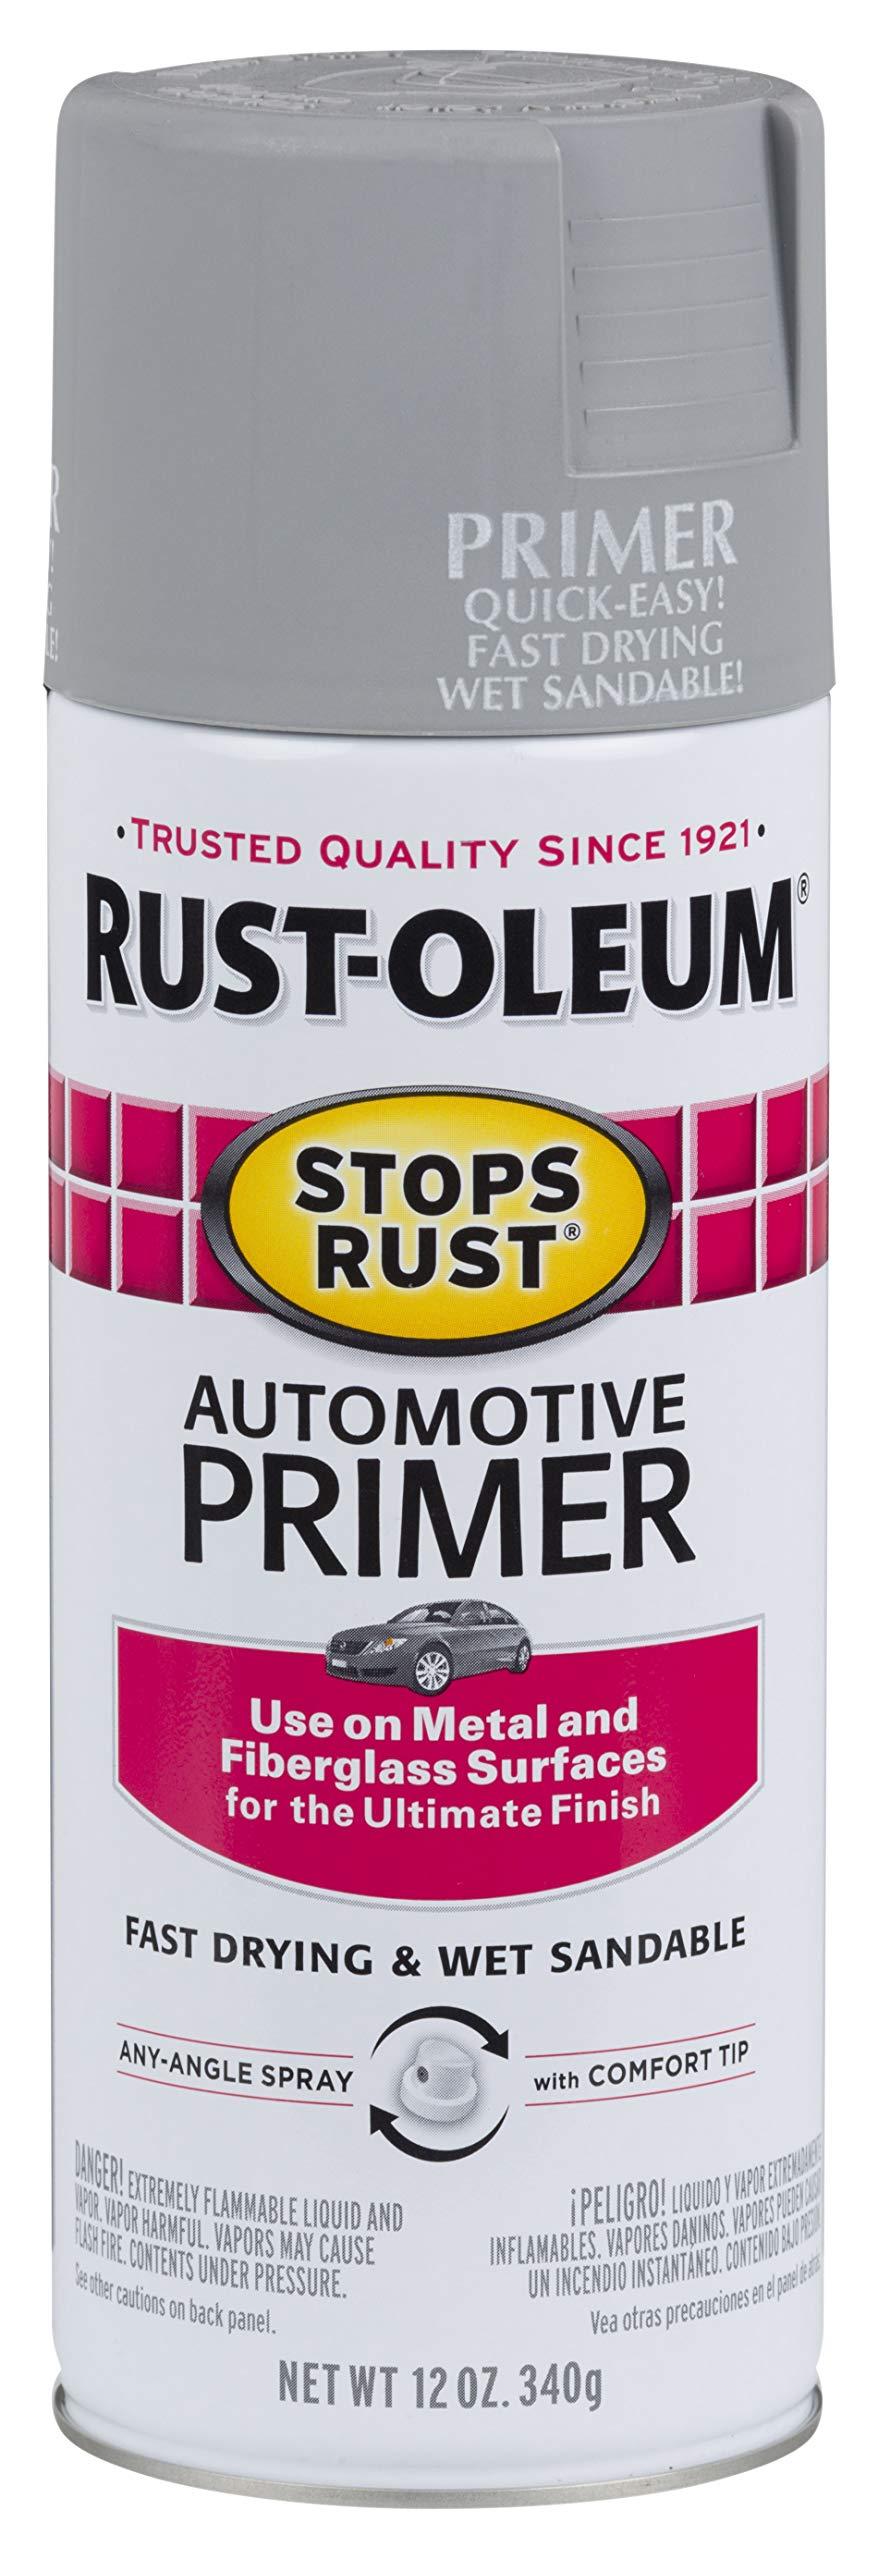 Rust-Oleum 2081830 Stops Rust Automotive Primer, 12 Oz, Light Gray